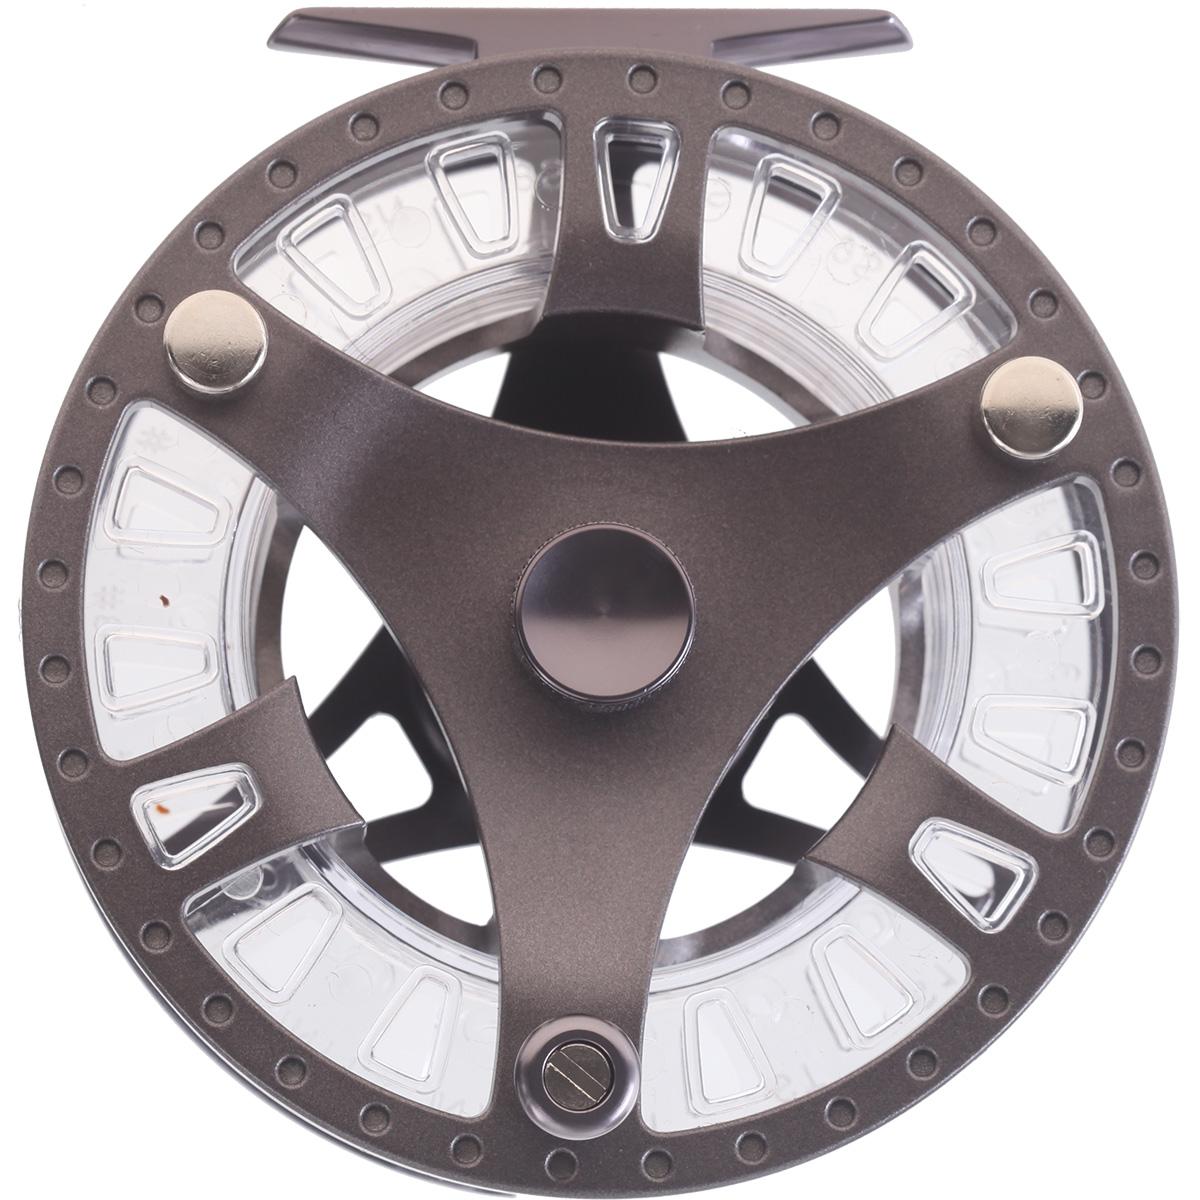 Graus GTS 700 - (Fly Fishing Reels) Reels) Fishing 3c8bd4